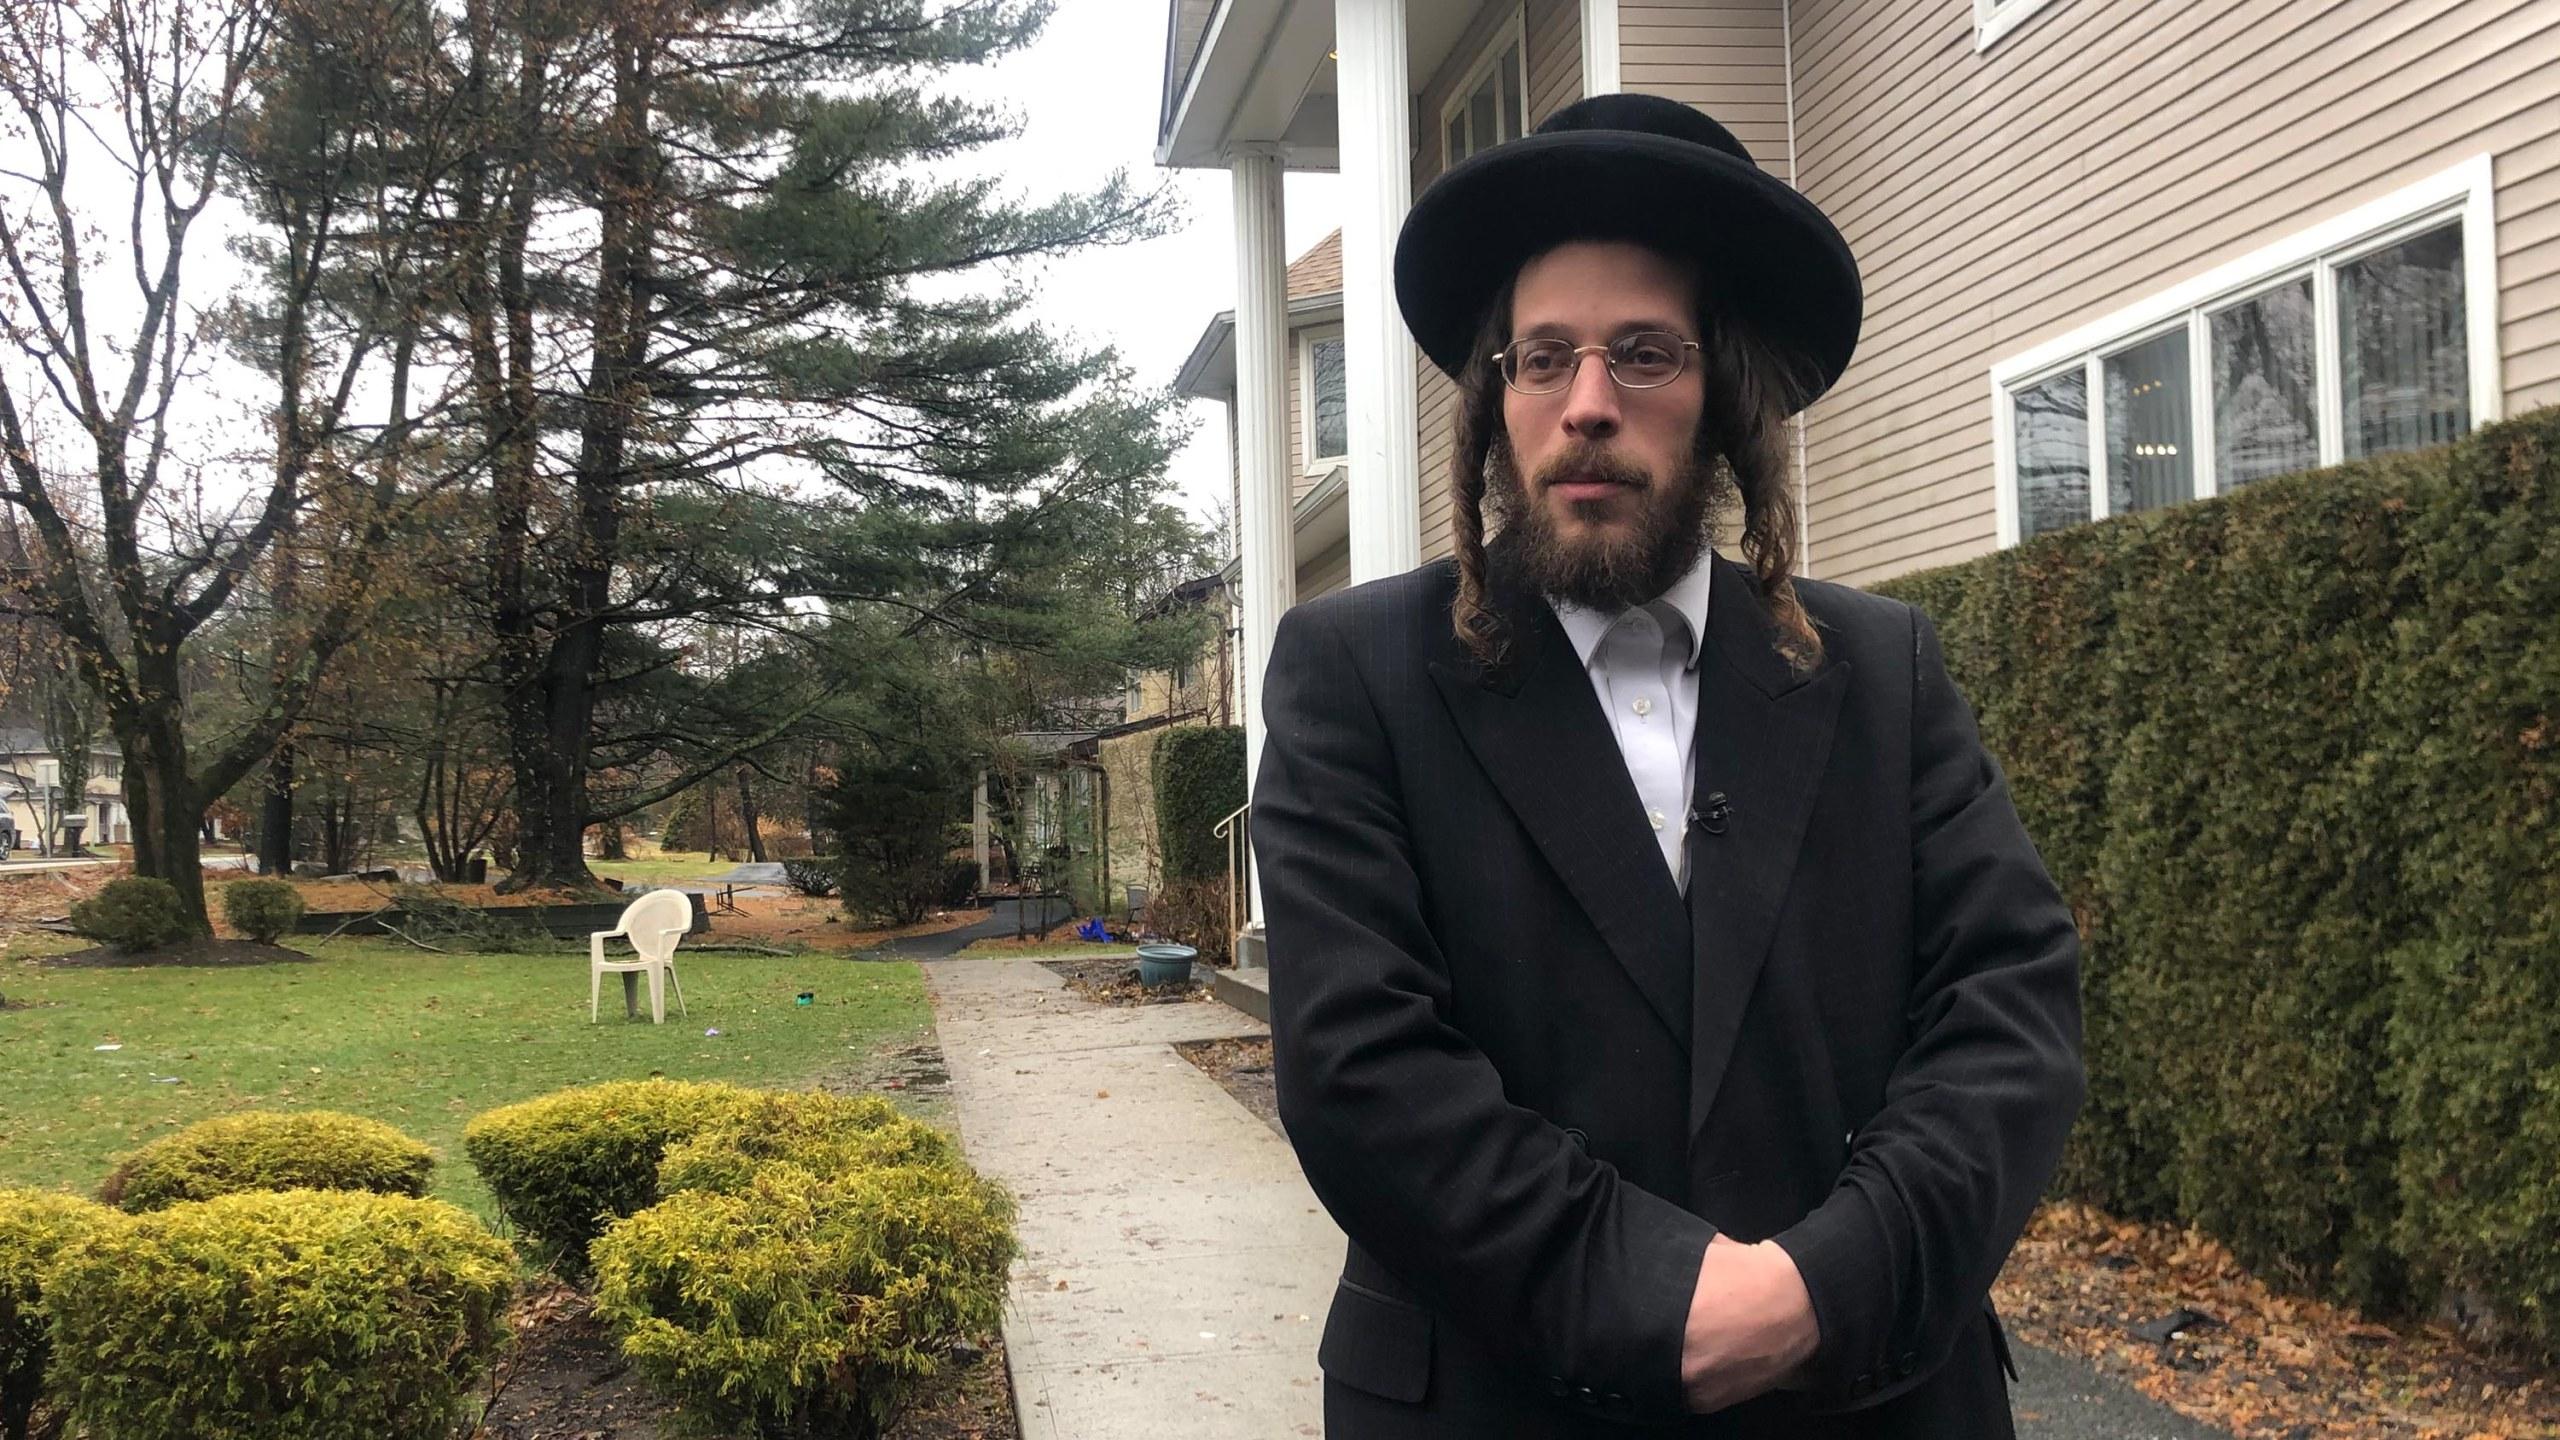 Josef Gluck, a survivor in the NY Hanukkah stabbing pictured on Dec 30, 2019.